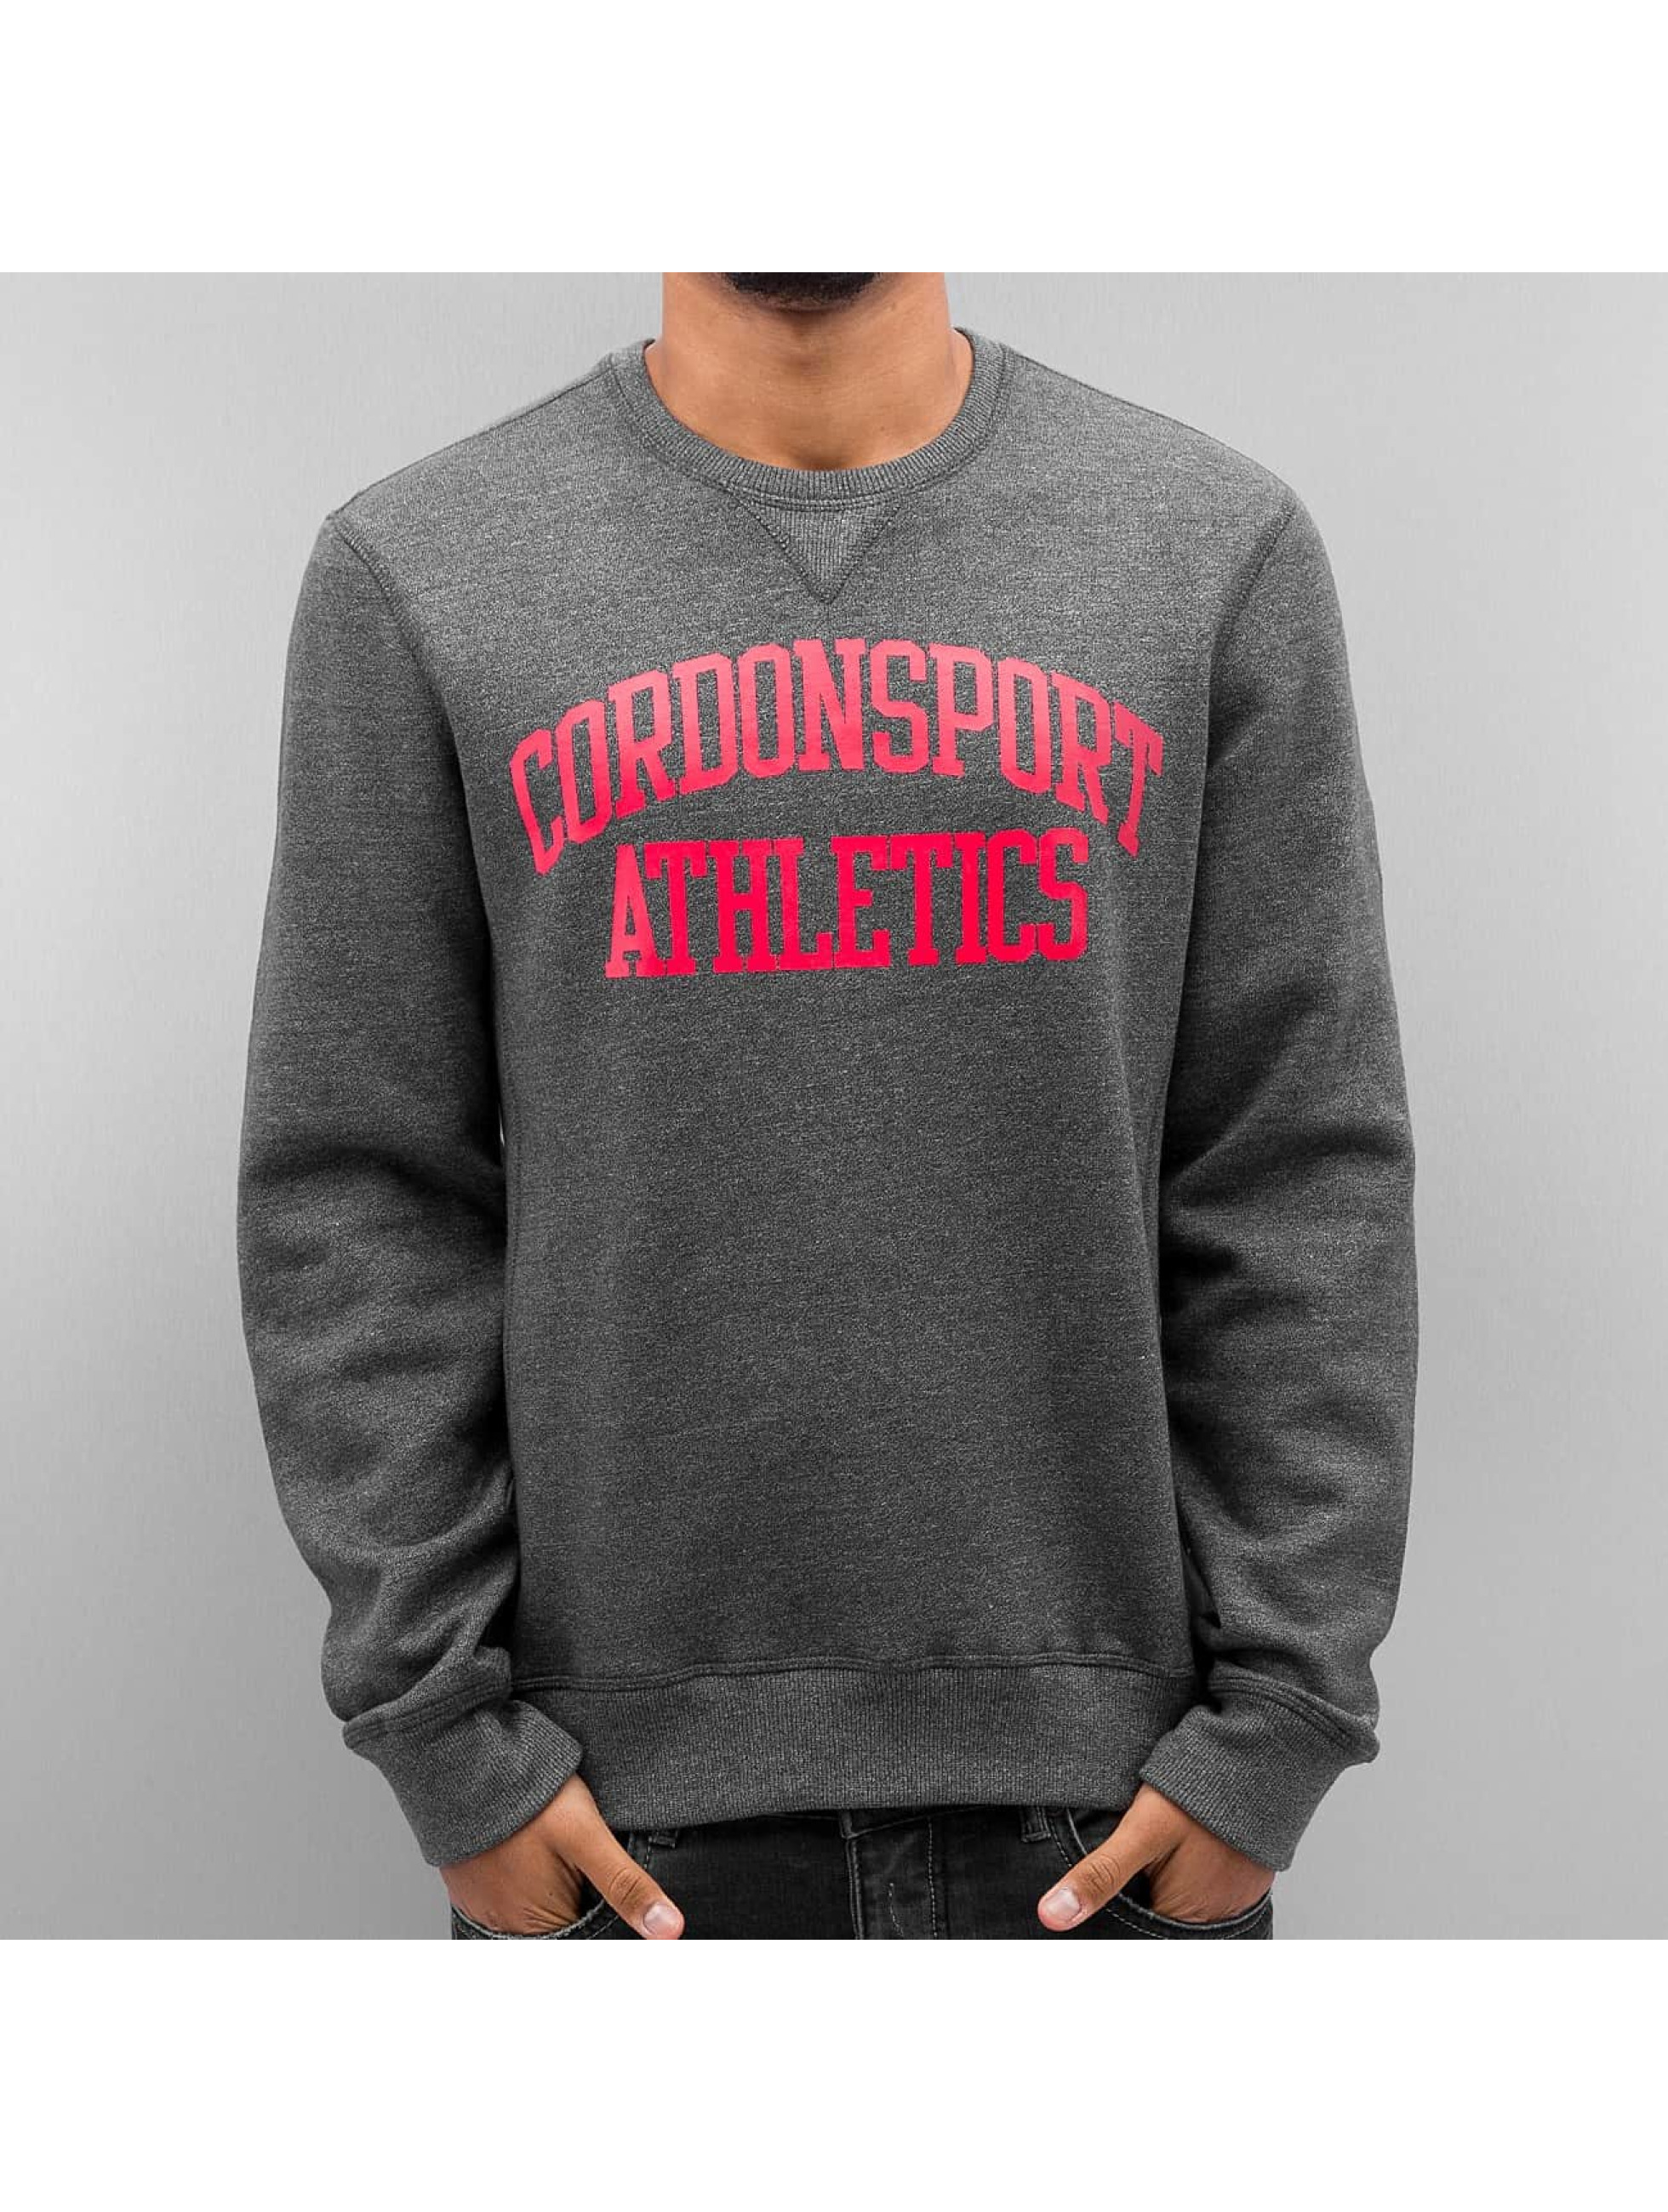 Cordon Пуловер Kolt серый